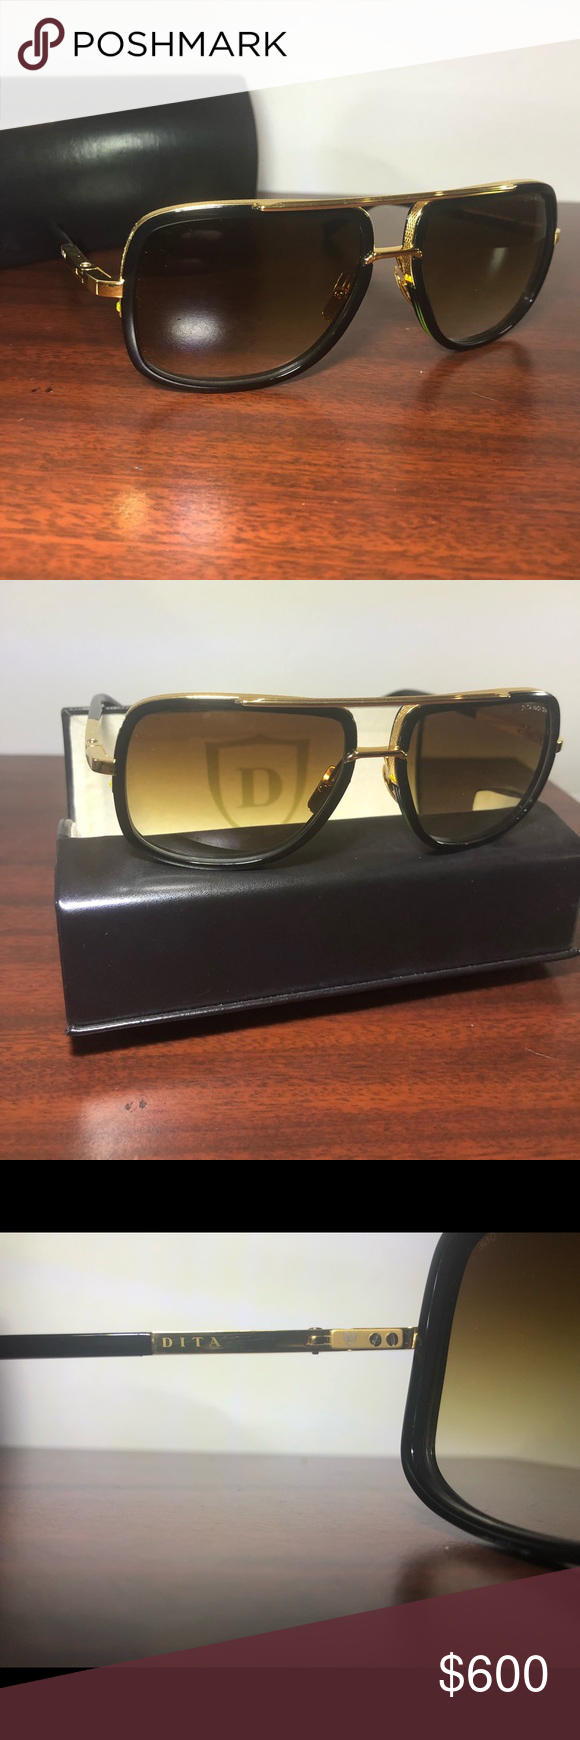 f453da938a56 Dita MACH-ONE Black Shiny 18k Sunglasses Dita MACH-ONE Black Shiny 18k Gold brown  Shaded (B-BLK-GLD A) Never Used Accessories Sunglasses